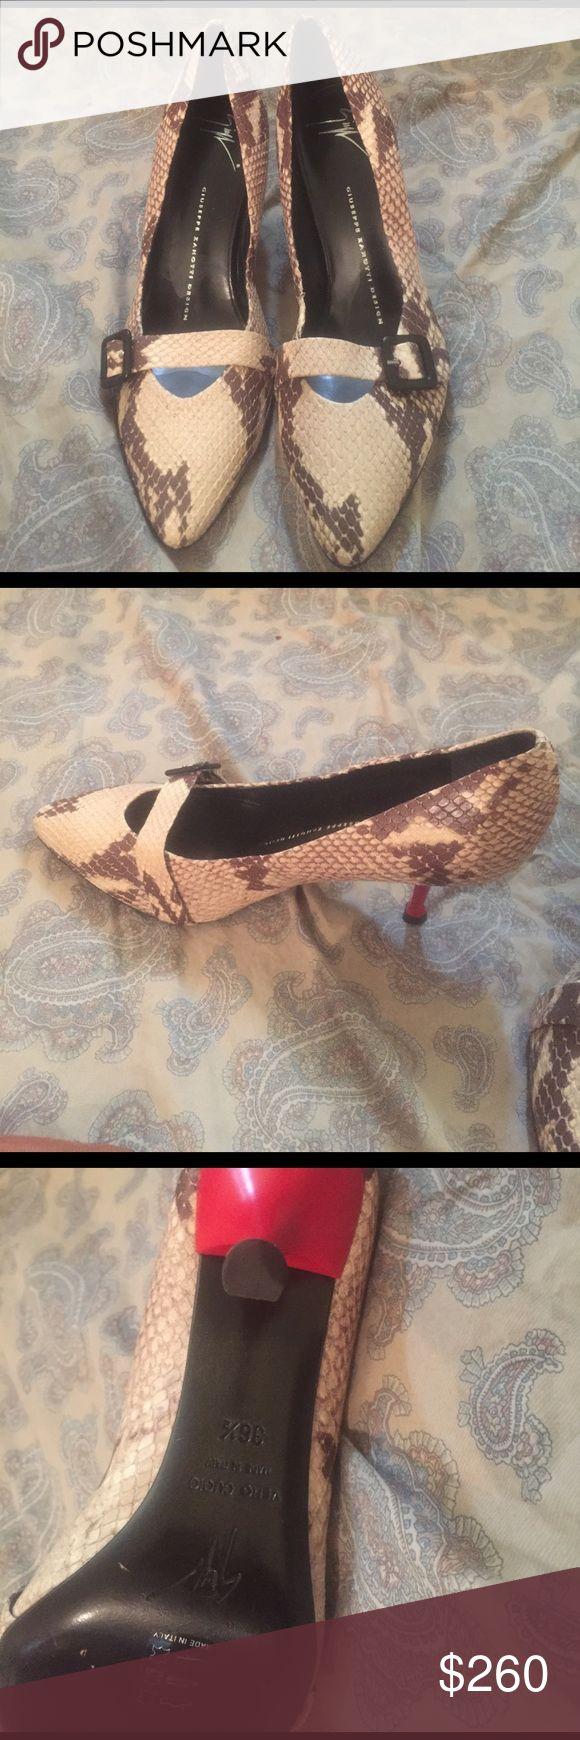 Giuseppe heels Authentic Giuseppe snake print heels worn once Giuseppe Zanotti Shoes Heels